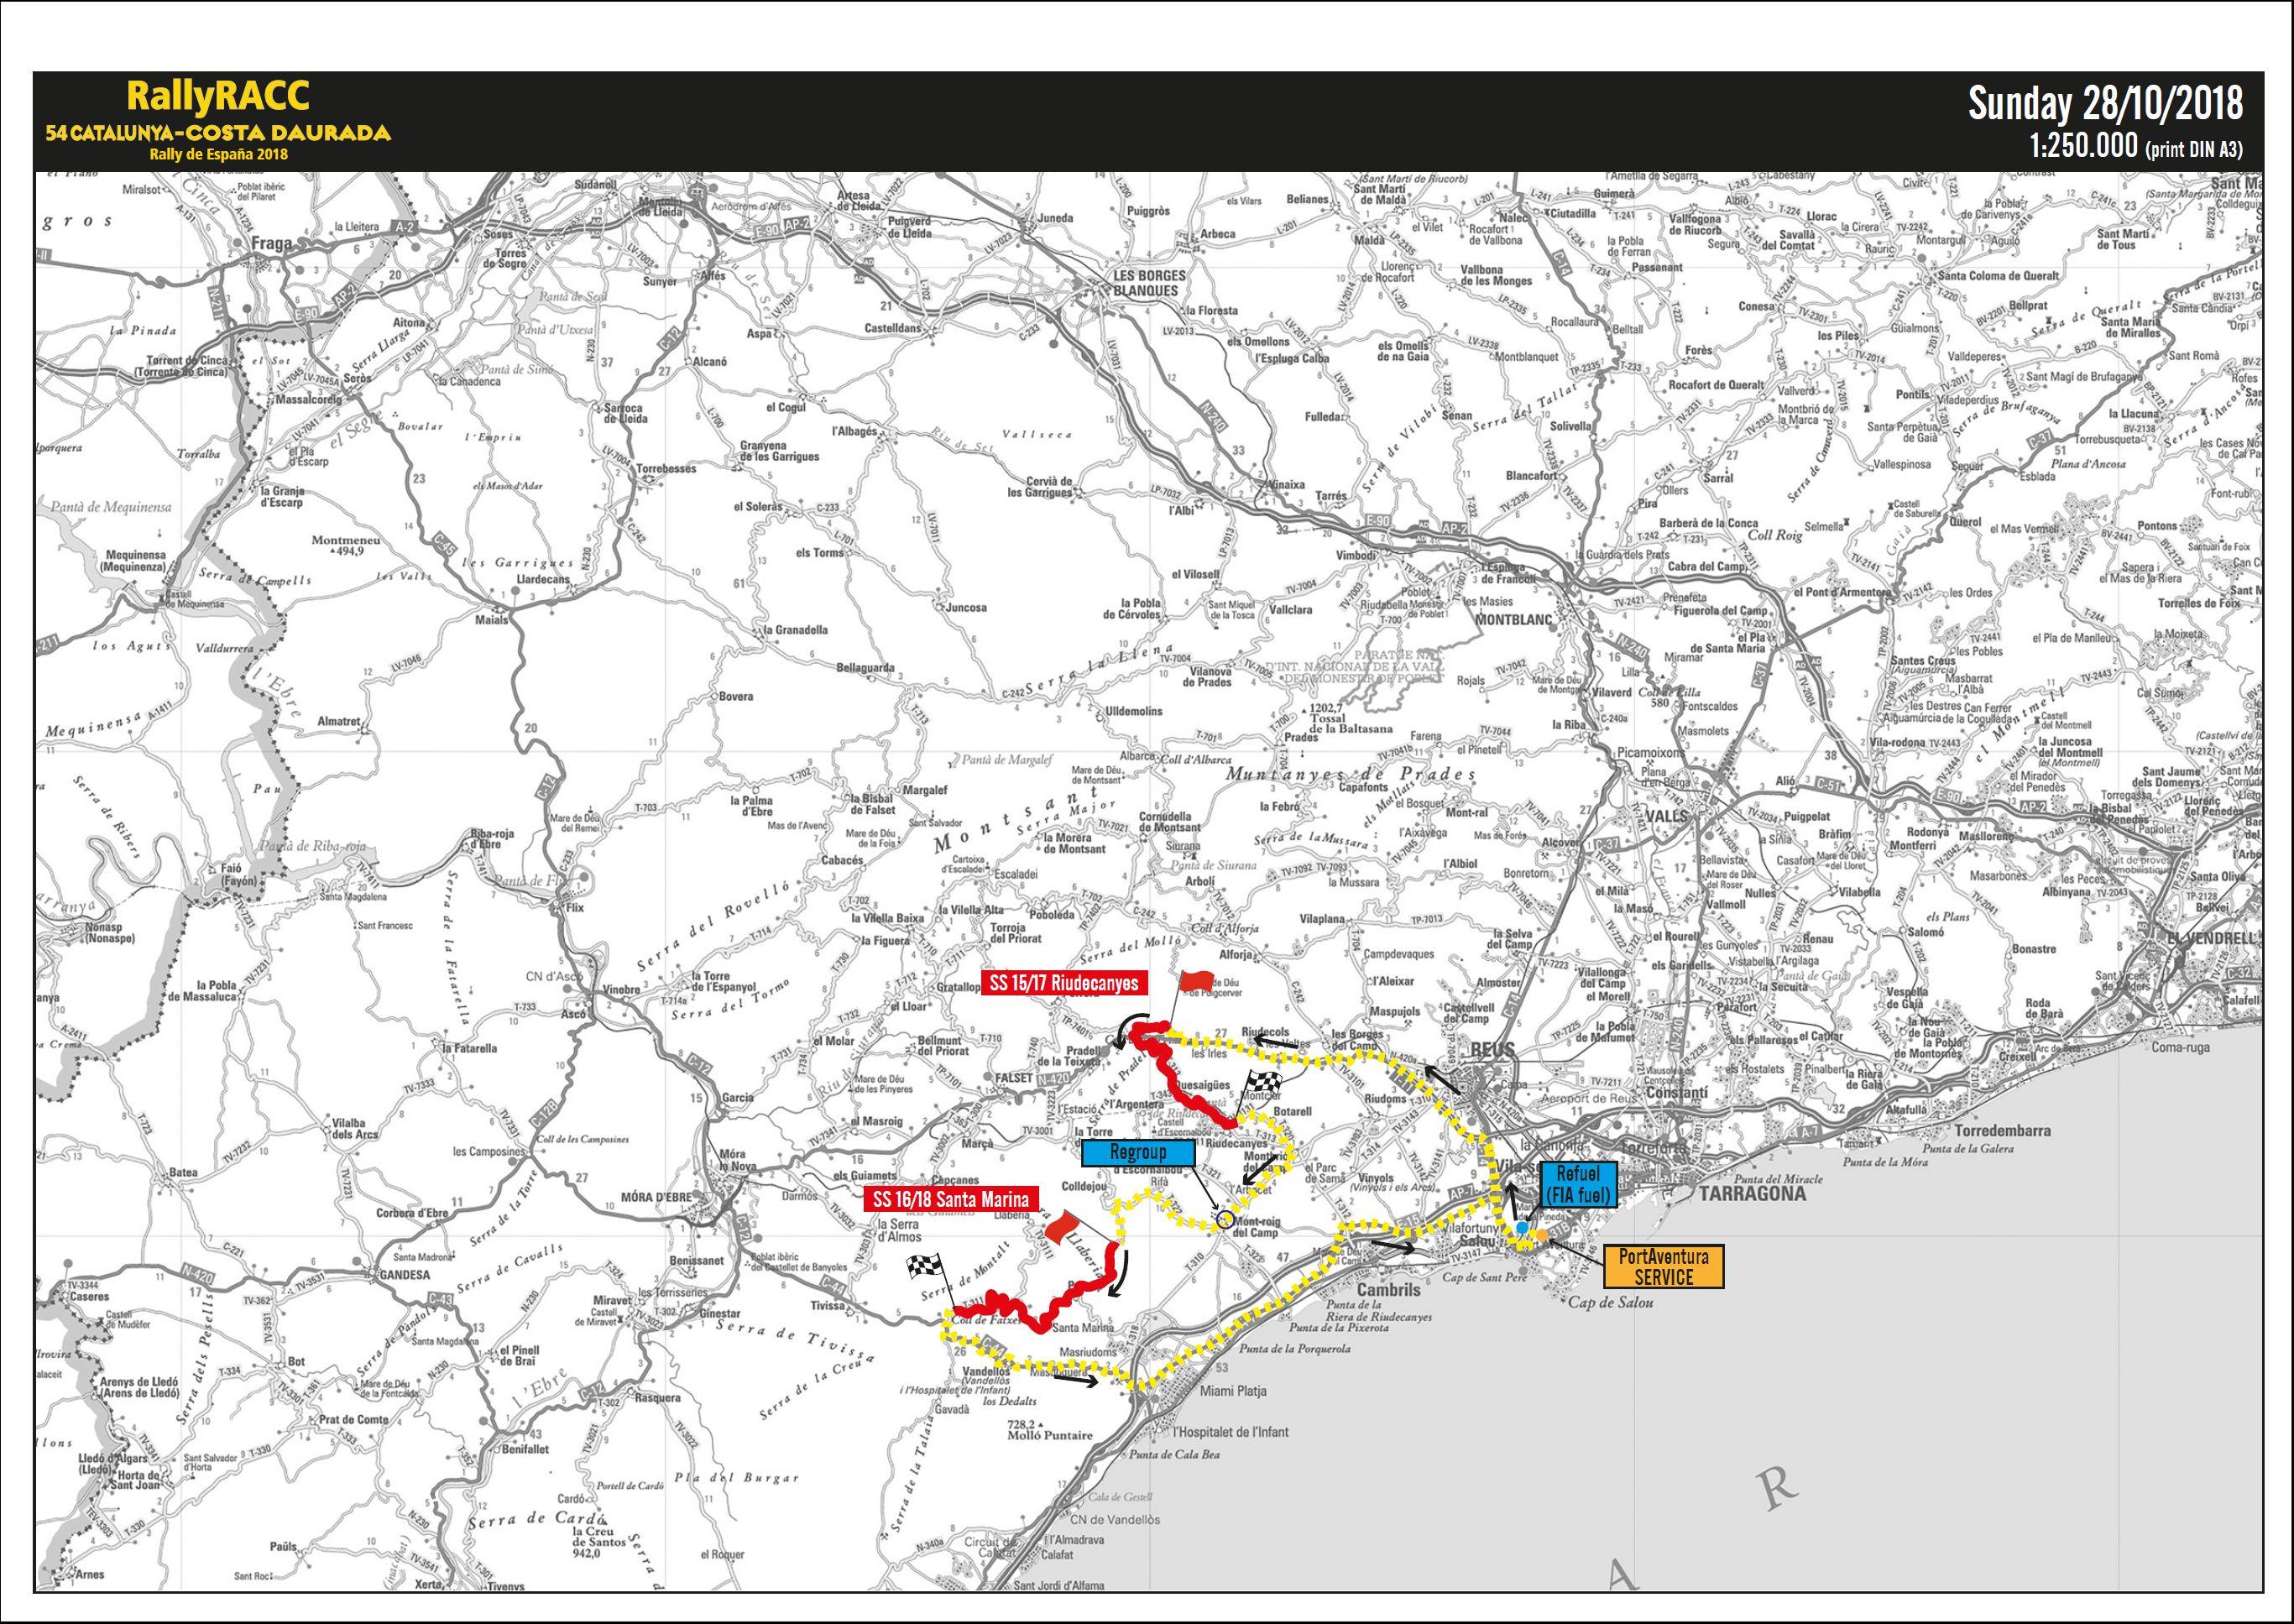 RallyRACC Catalunya - Costa Daurada 2018 Post-330-0-75263200-1536483463